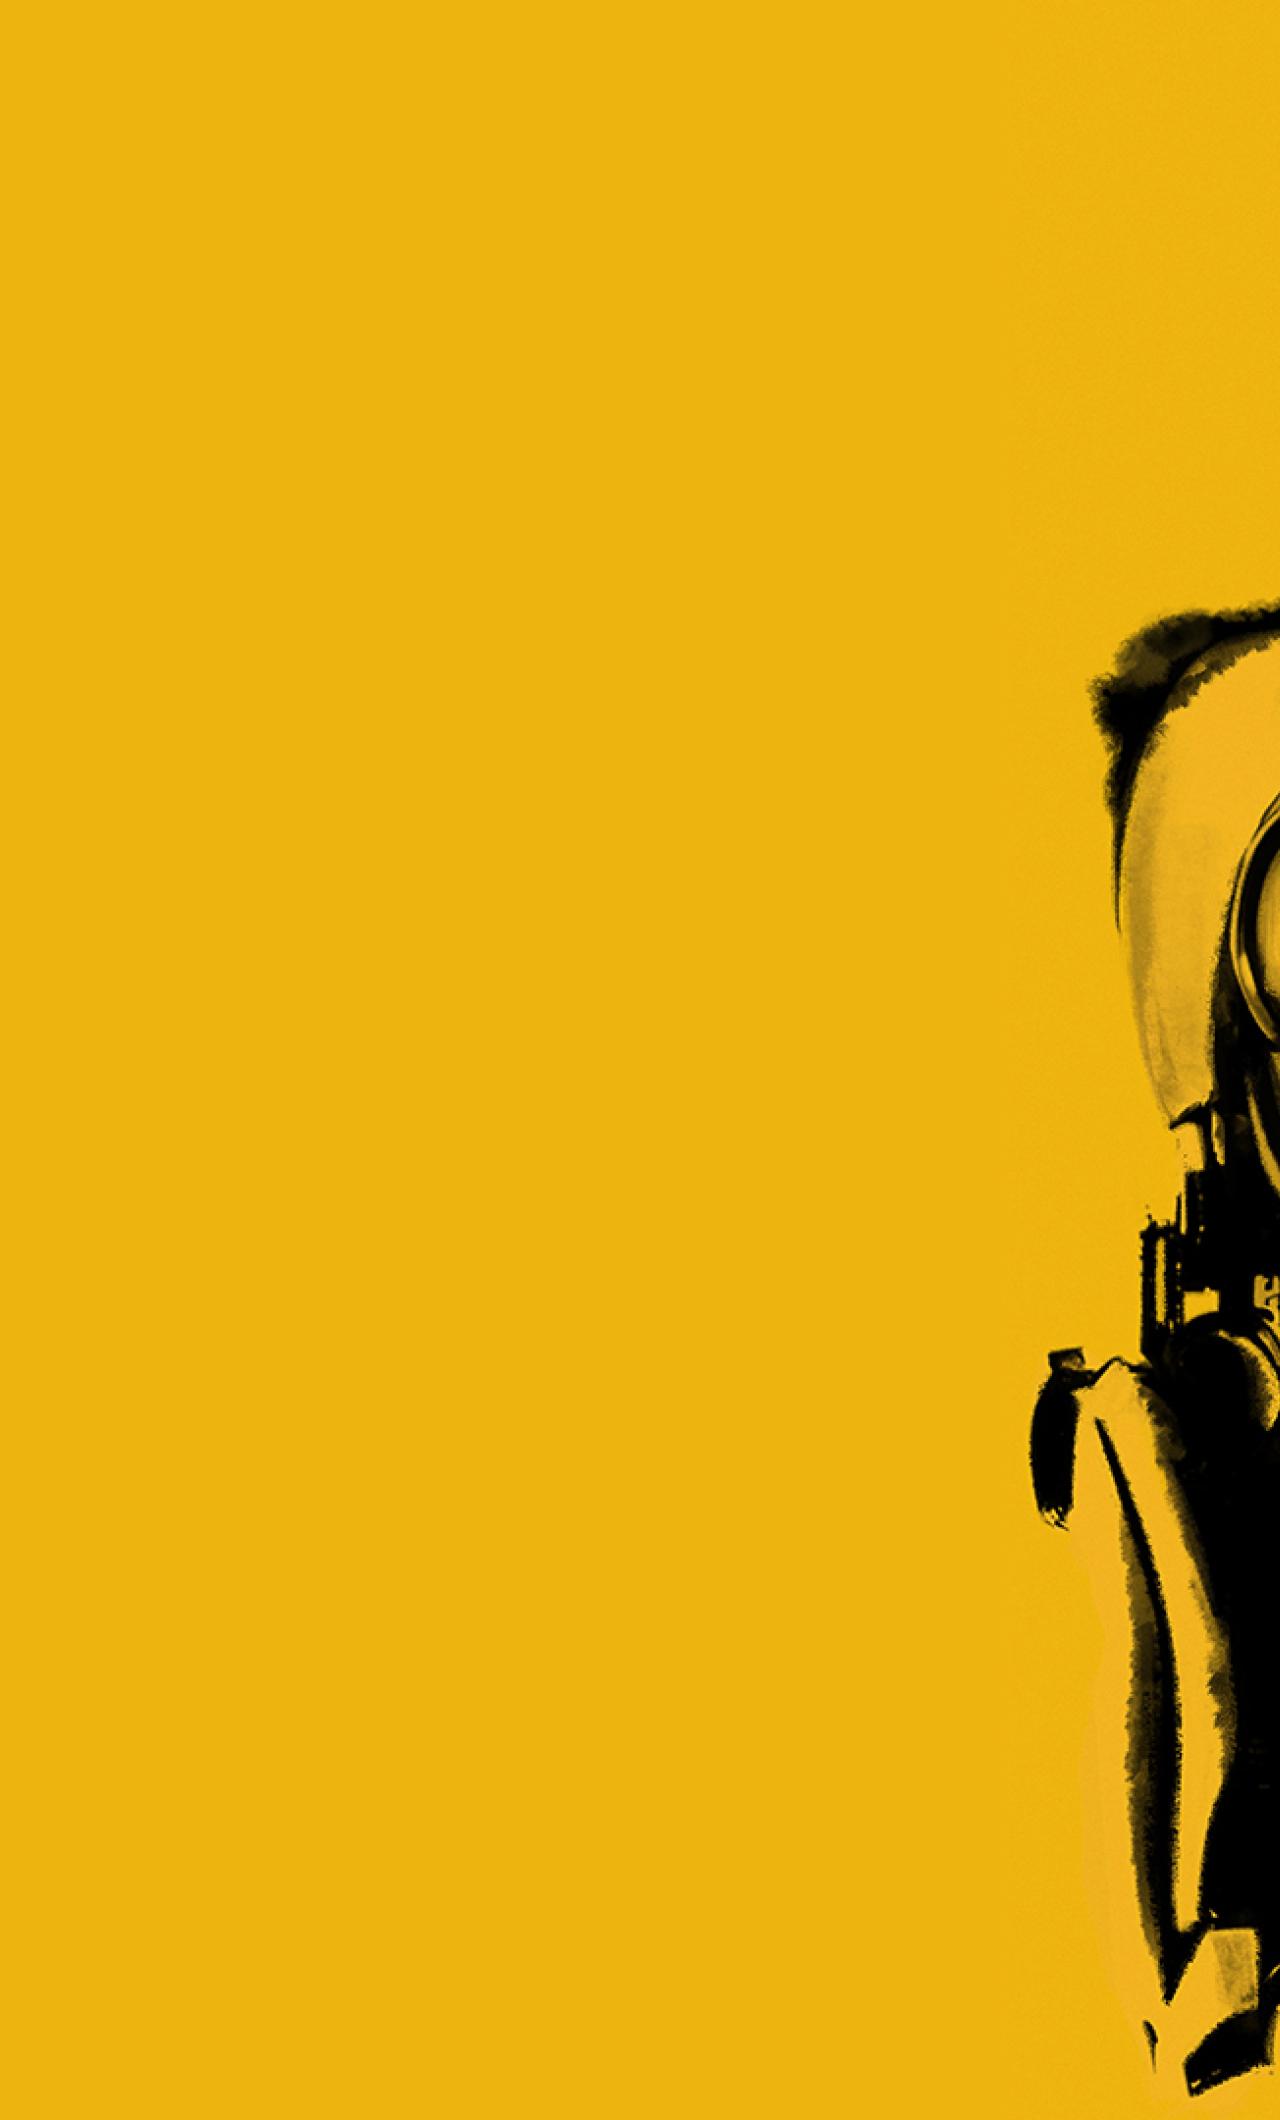 Bumblebee 2018 Comic Con Movie Poster, Full HD Wallpaper